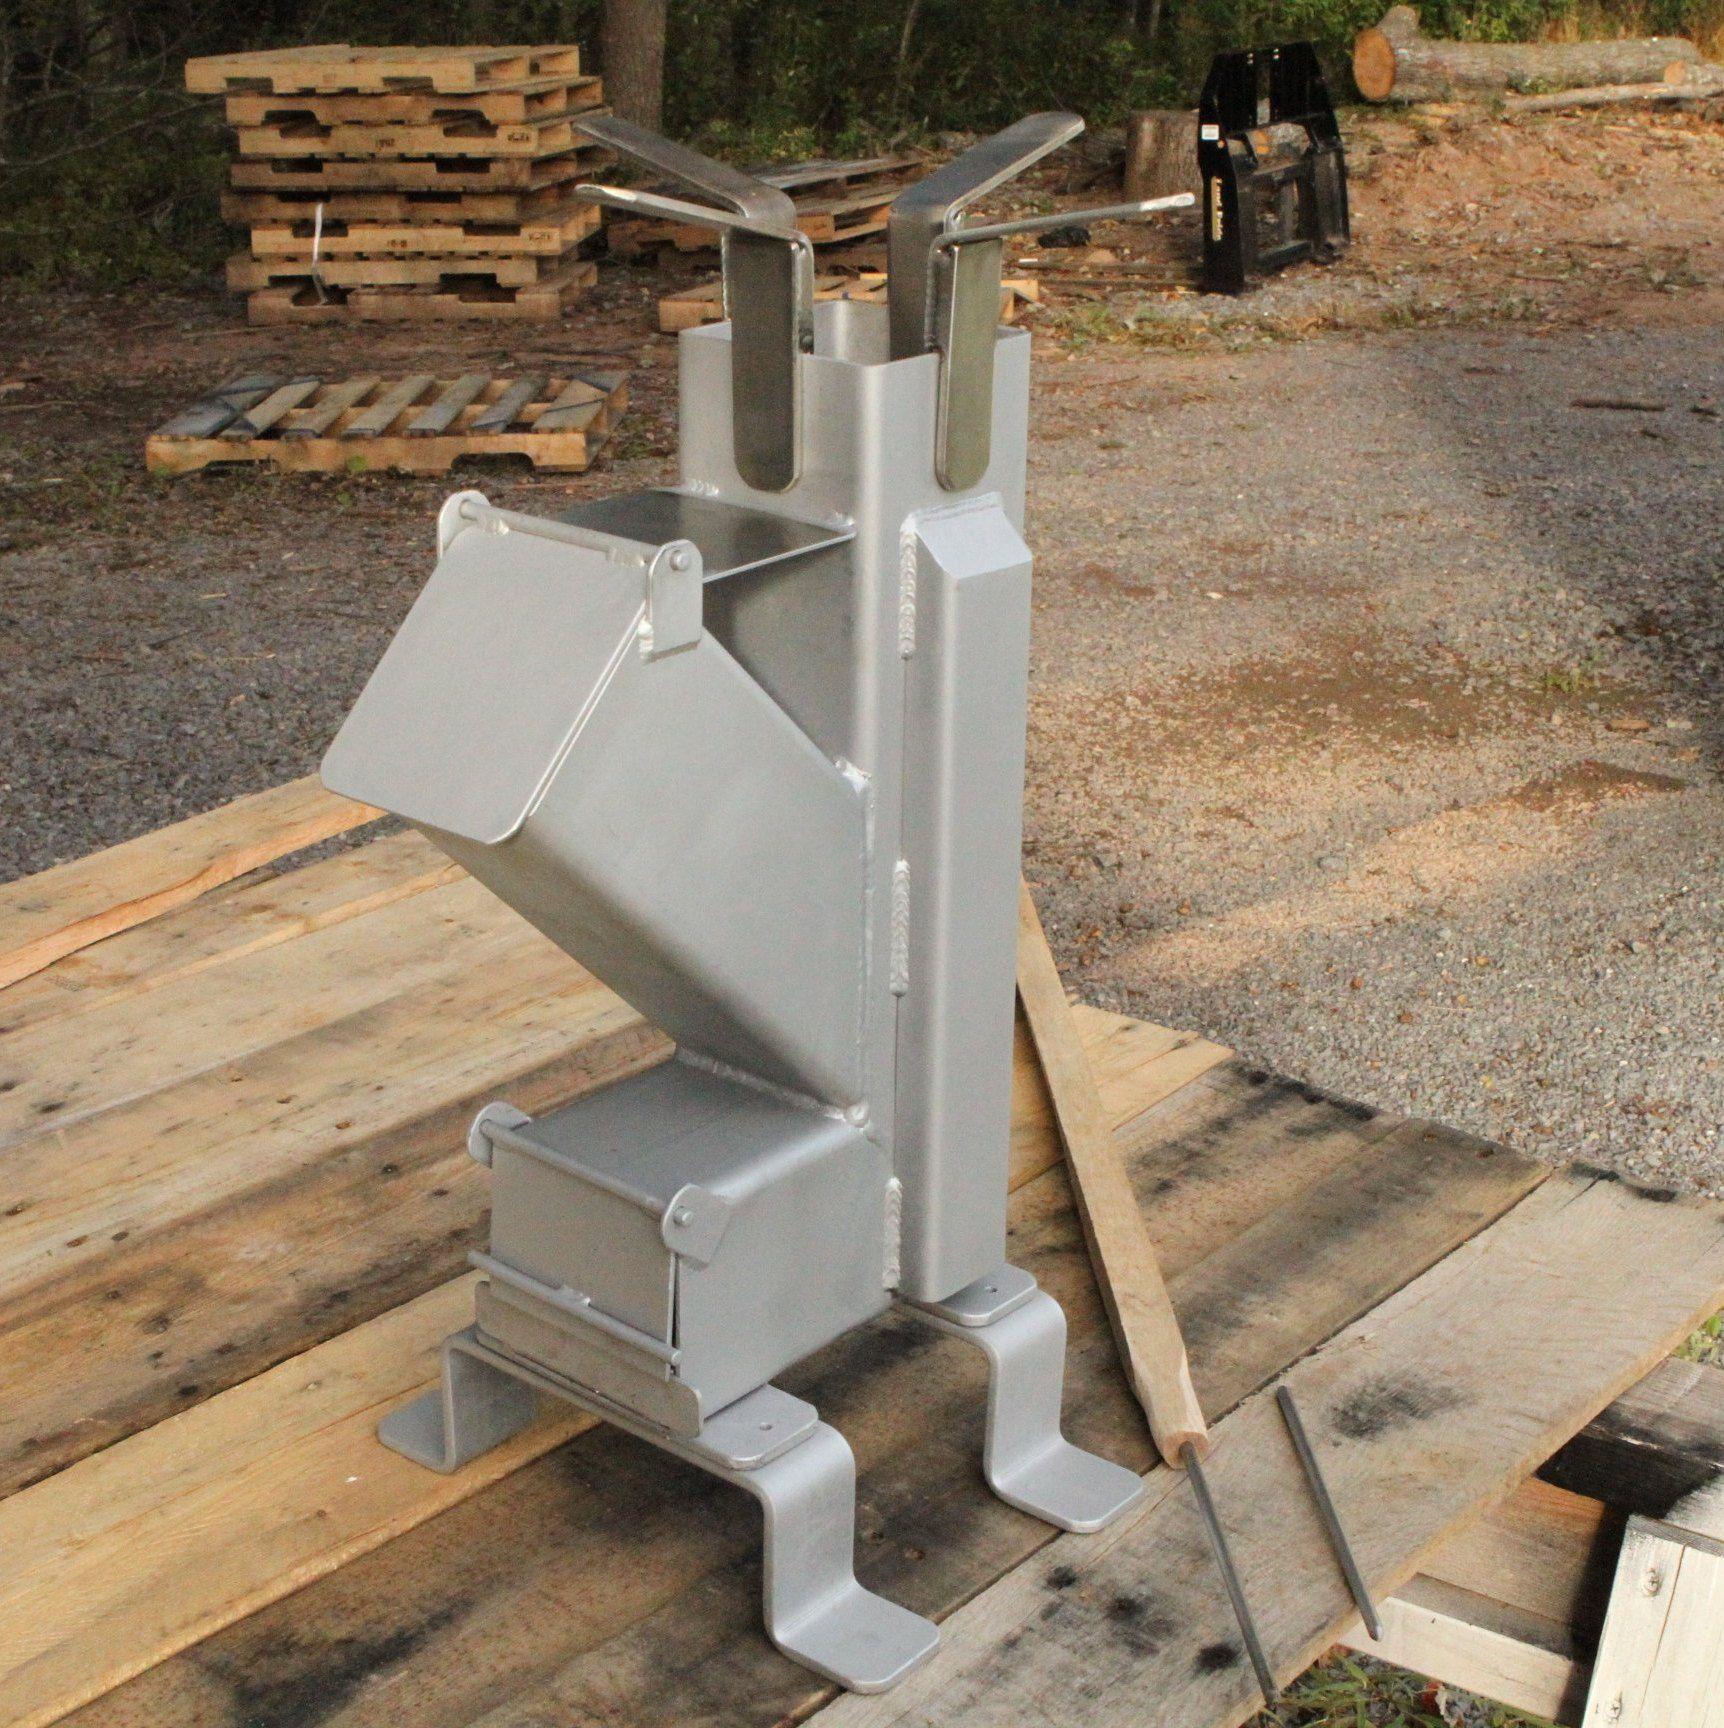 Stainless Steel Accessorized Self Feeding Rocket Stove Rocket